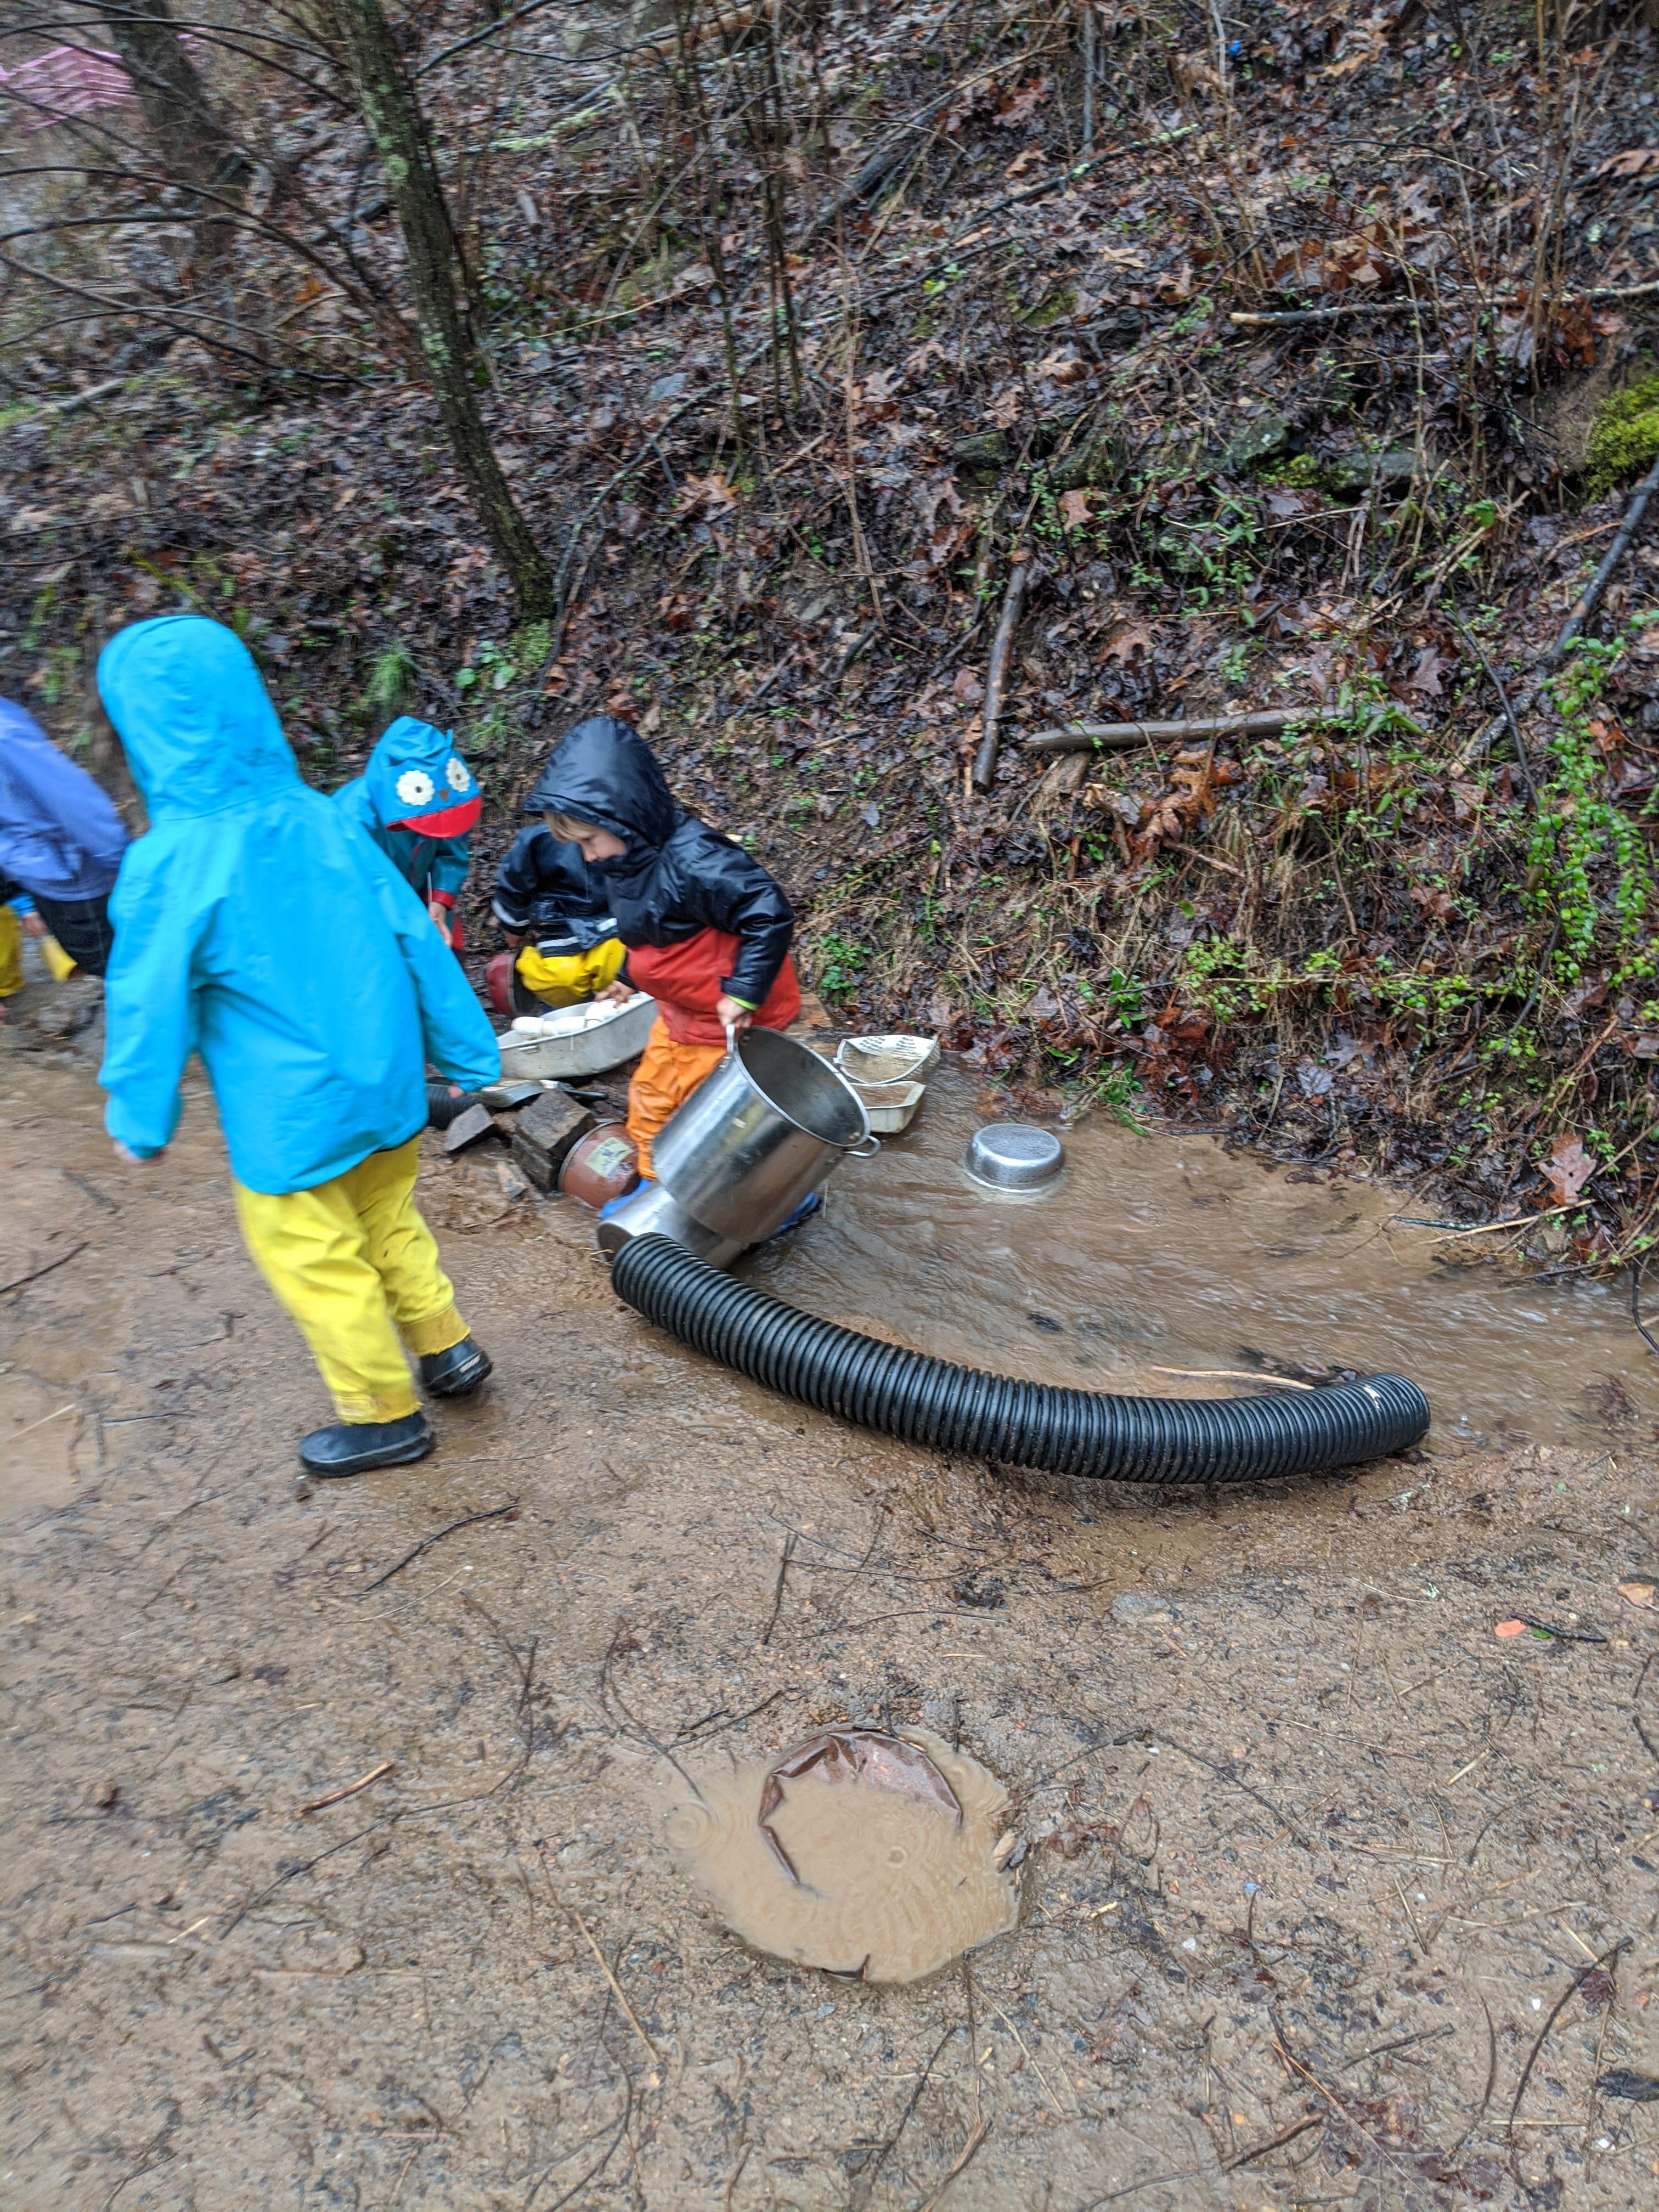 Ashevillefarmstead-creekplay-mudplay-rainyday